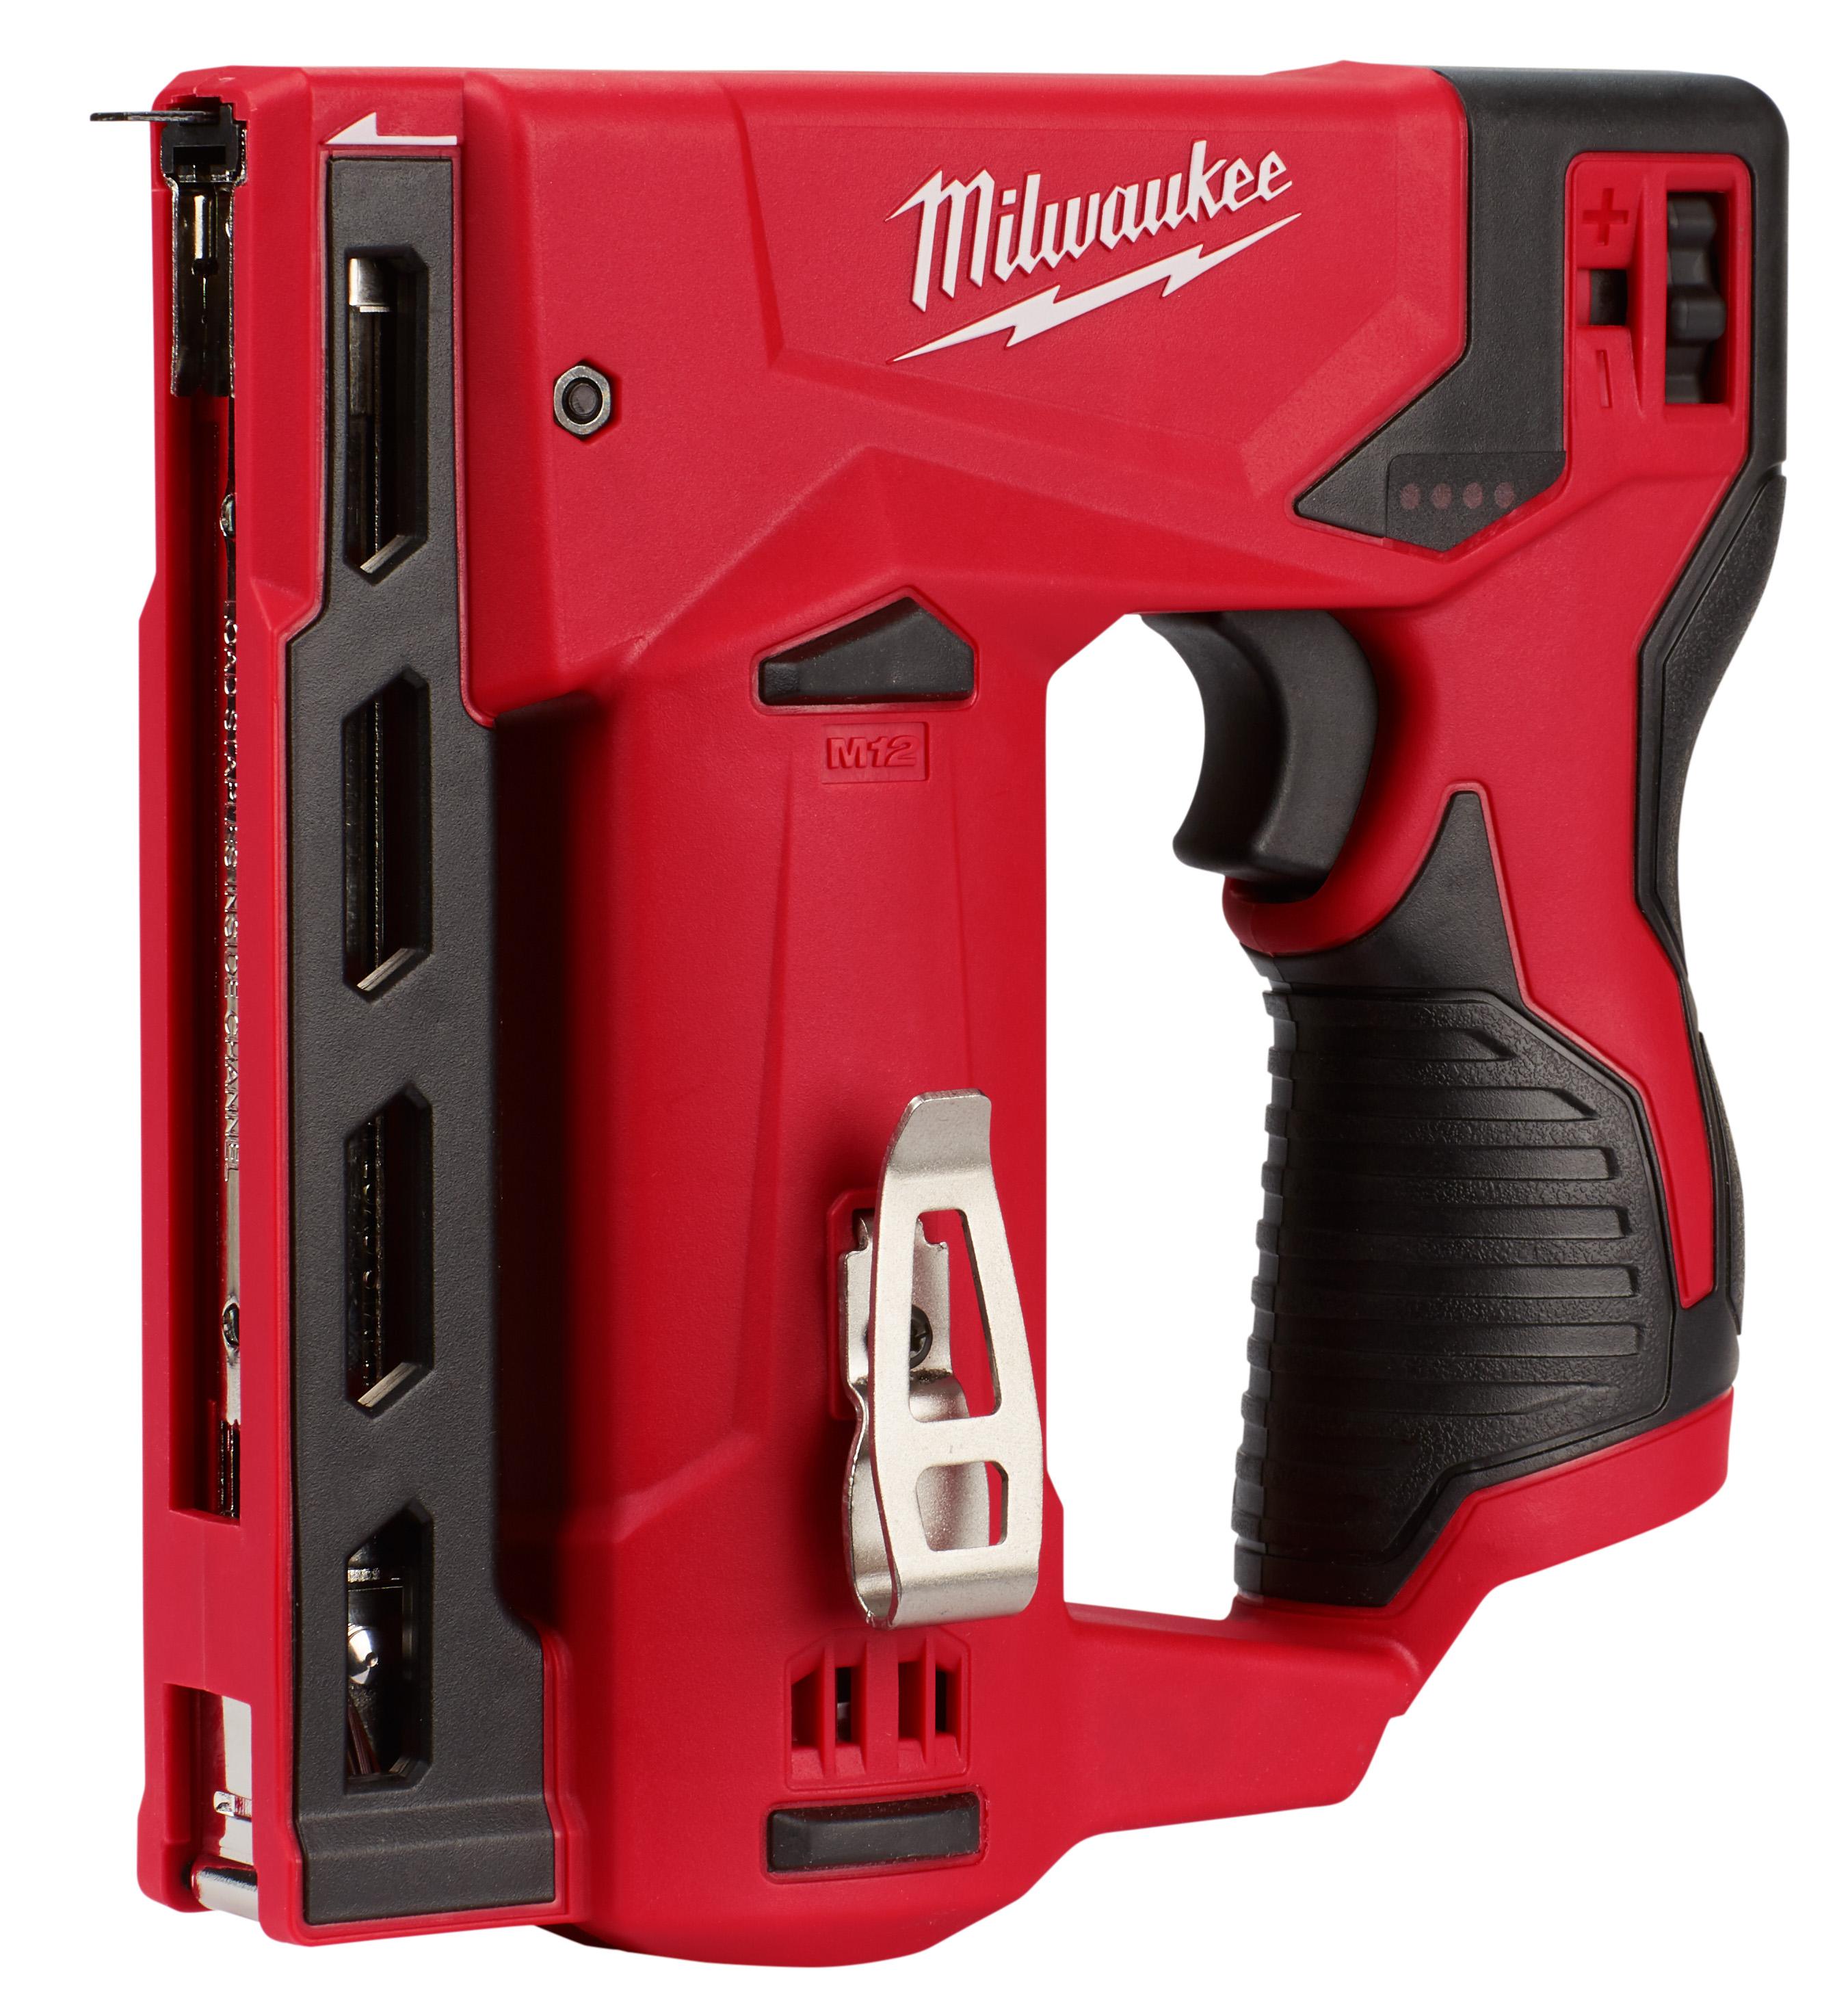 Milwaukee® 2447-20 Flat Crown Crown Stapler, 3/8 in W Crown, 89 Staple, For Fastener Type: Staples, 7-1/4 in OAL, M18™ REDLITHIUM™ Battery